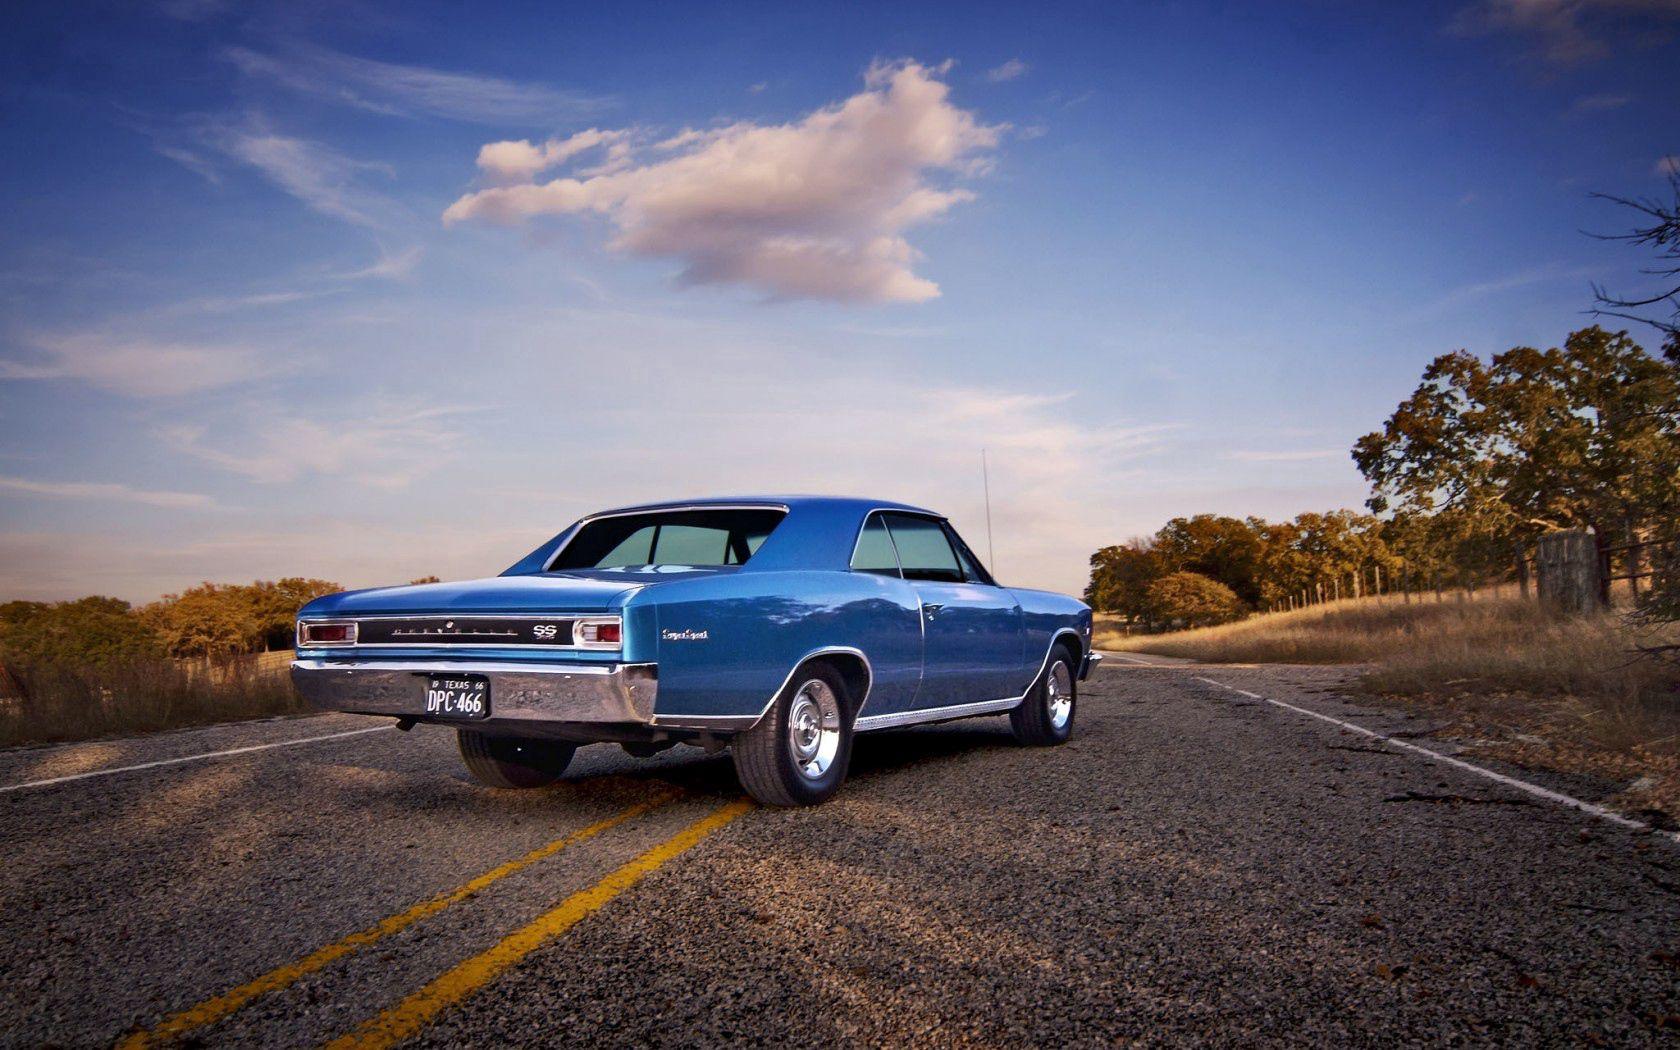 96409 скачать обои Тачки (Cars), Шевроле (Chevrolet), Chevelle, 1966, Вид Сзади - заставки и картинки бесплатно